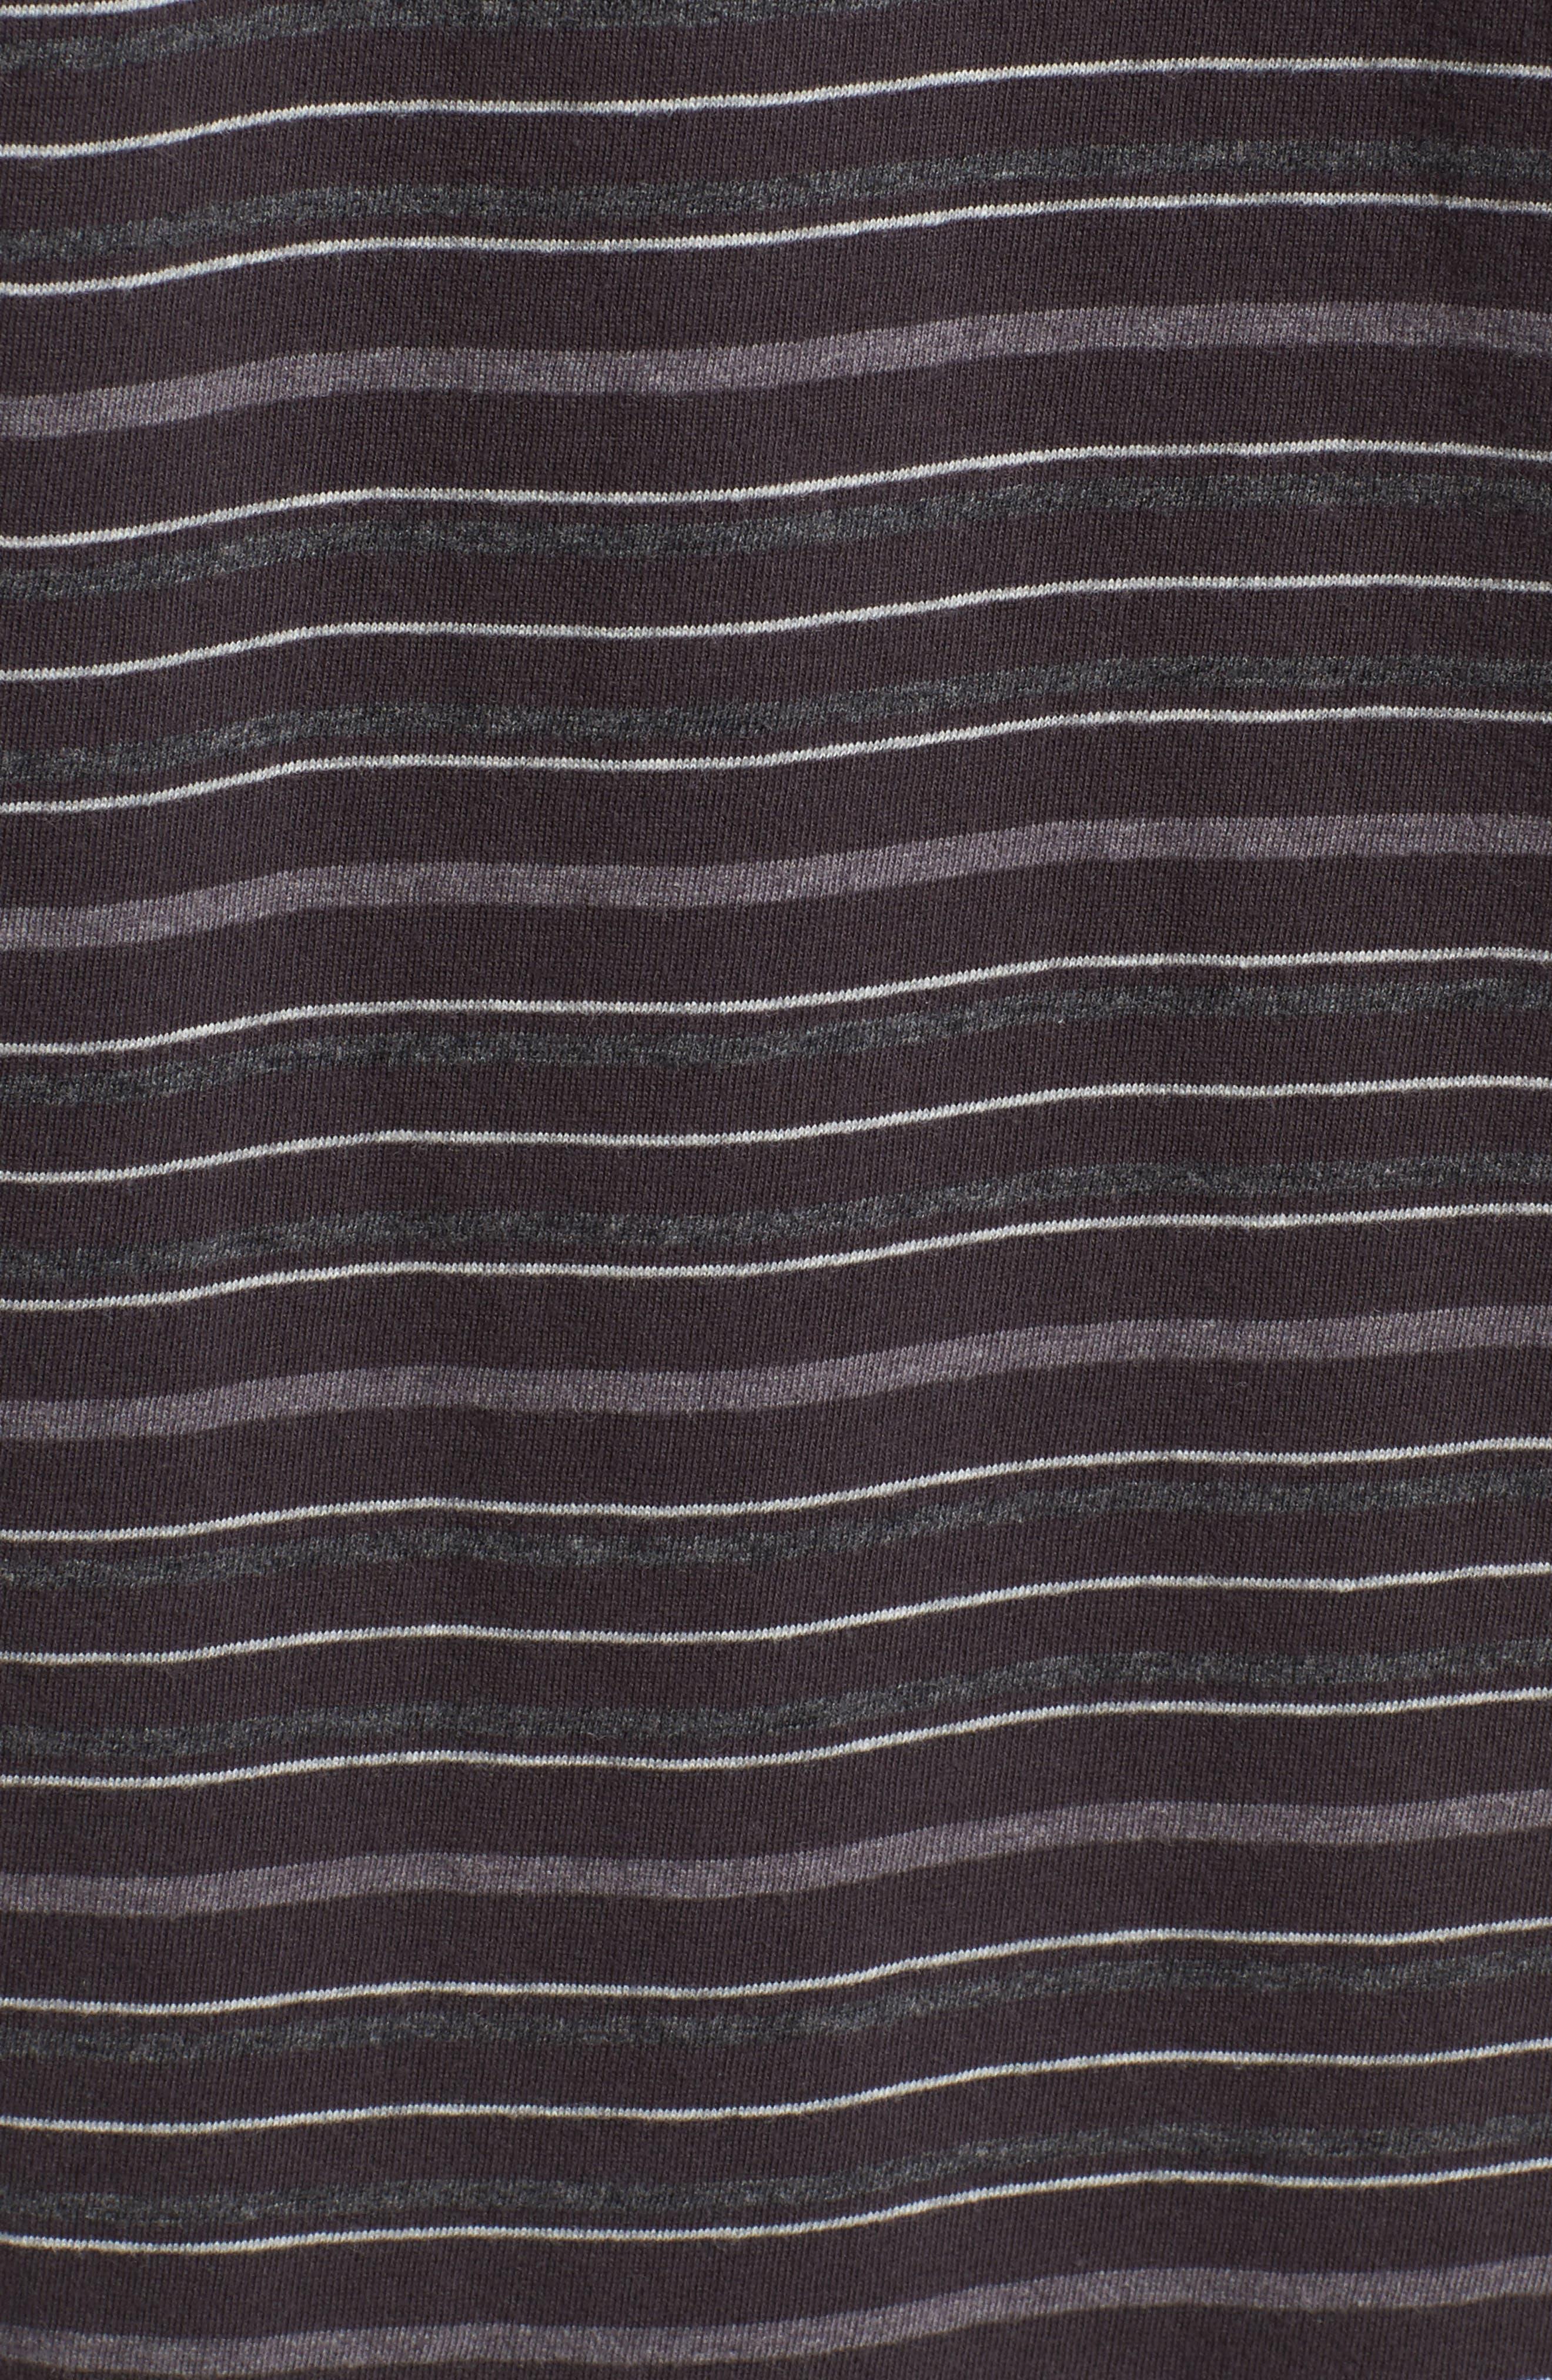 Full Tide T-Shirt,                             Alternate thumbnail 5, color,                             005